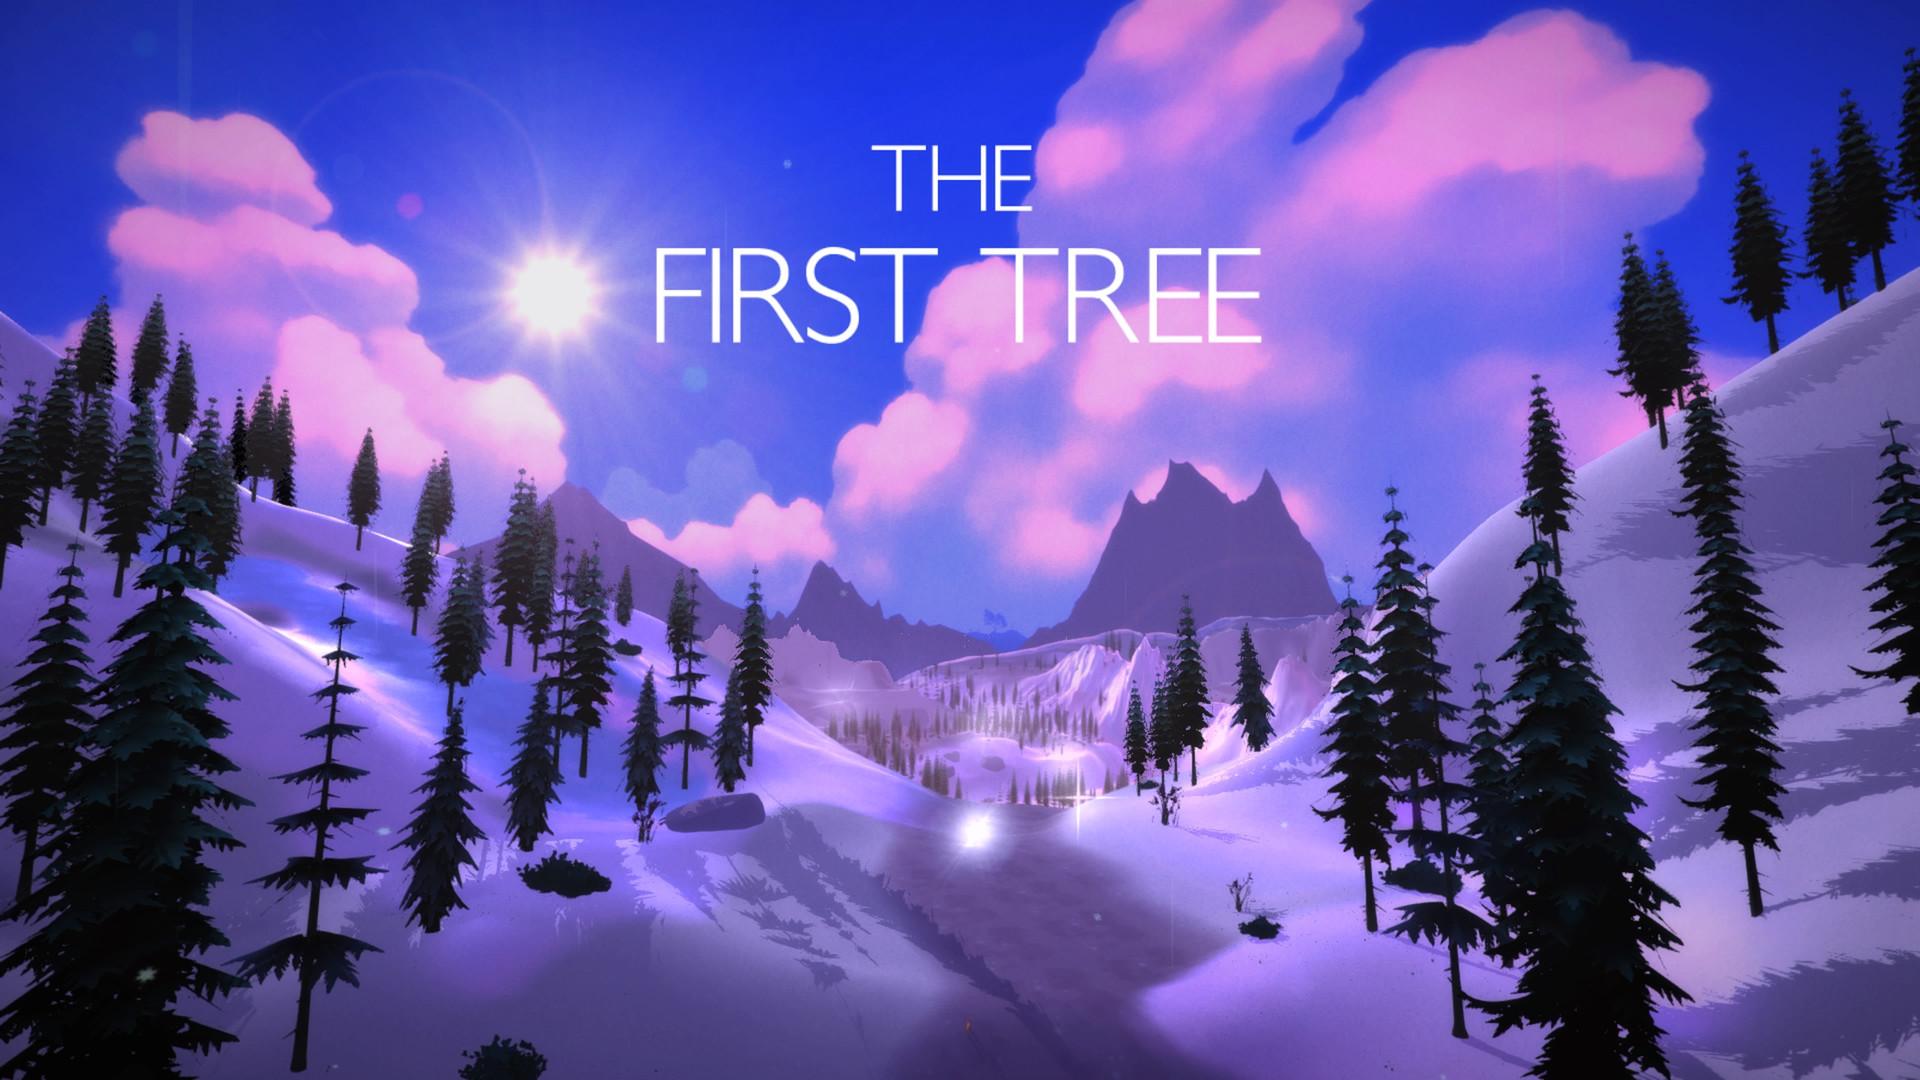 The First Tree_20200507231525.jpg